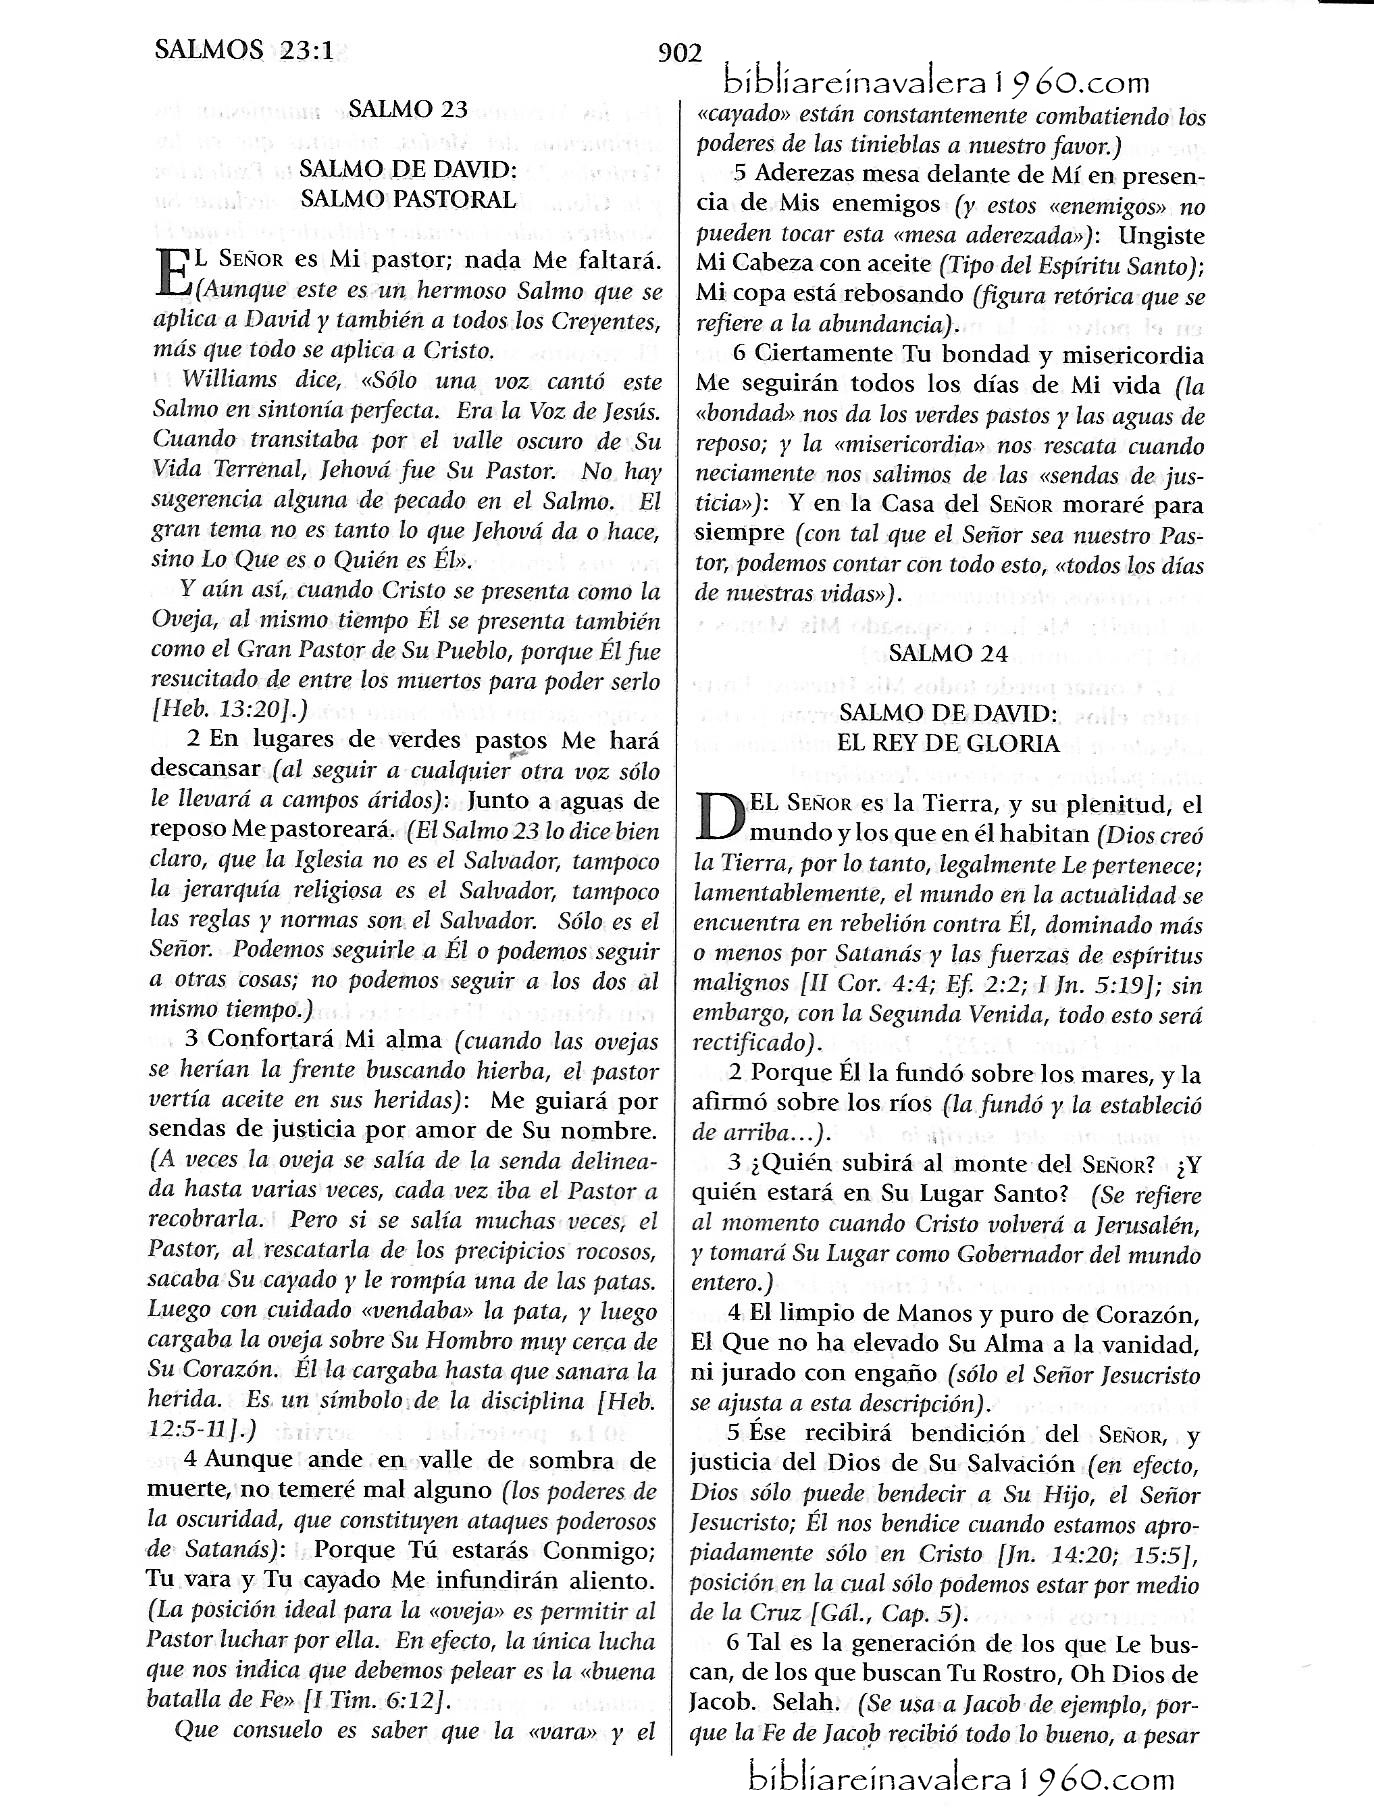 Salmos 24 Explicacion Biblia Reina Valera